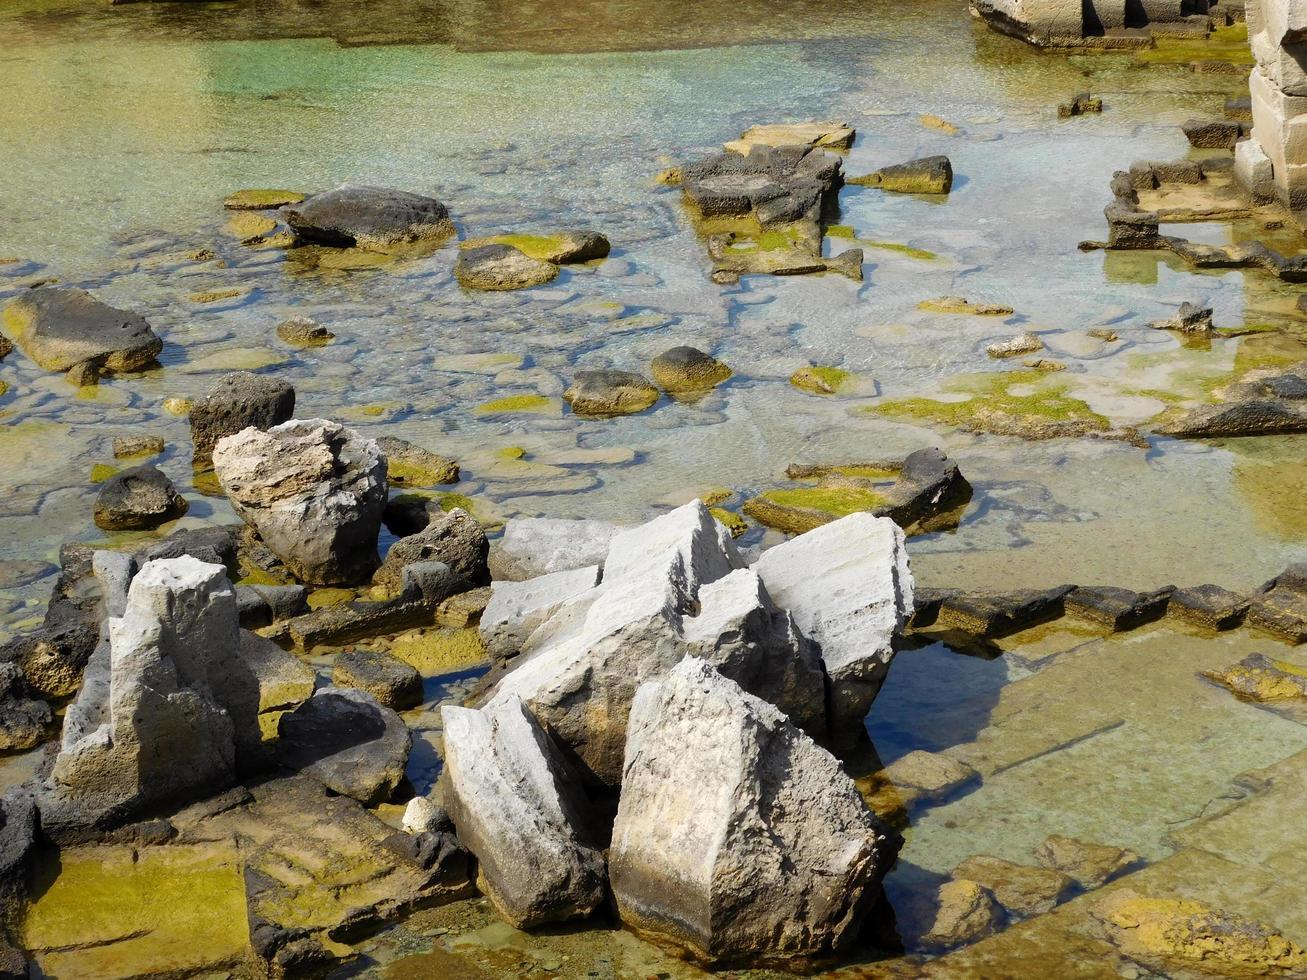 Rocks in a pond photo